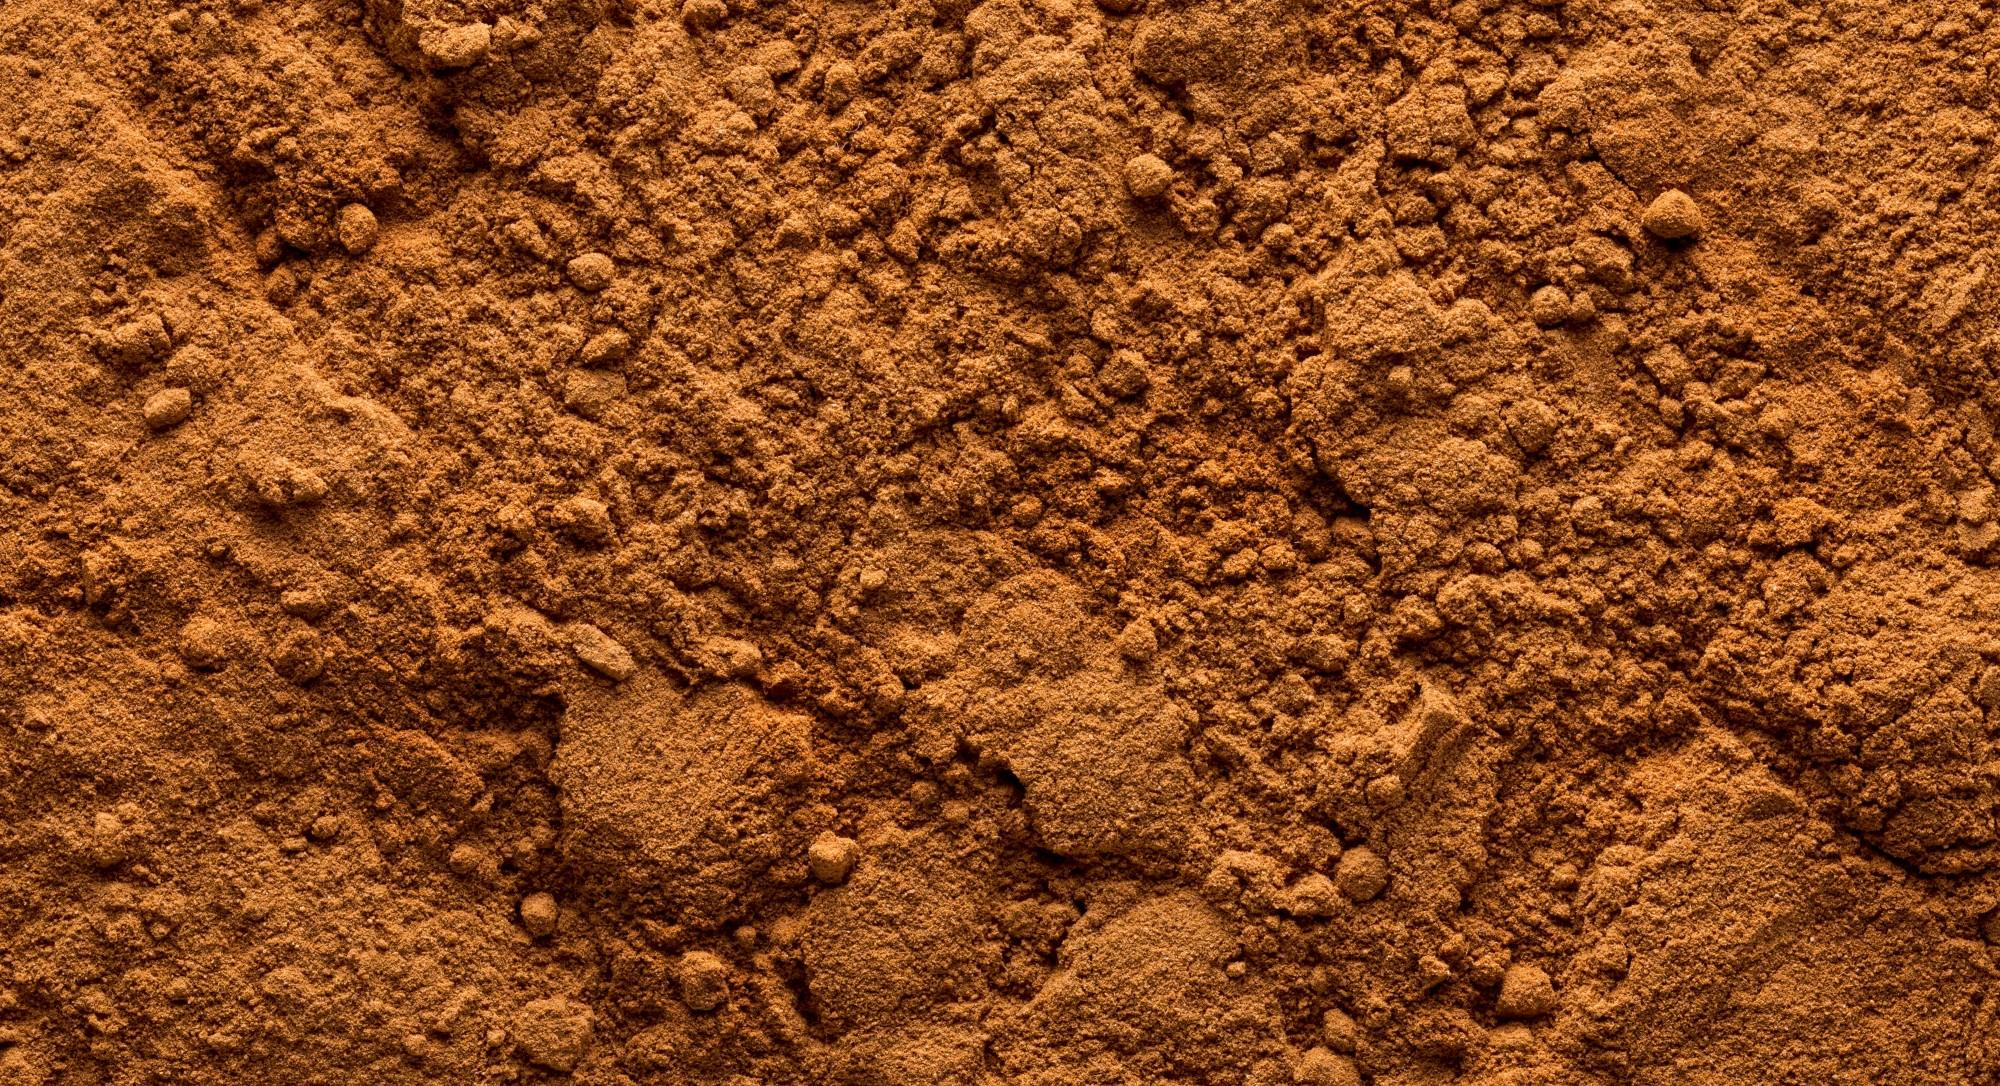 Ingredient of the Week: Cinnamon, The Brain-Boosting, Heart-Protecting Superfood Spice